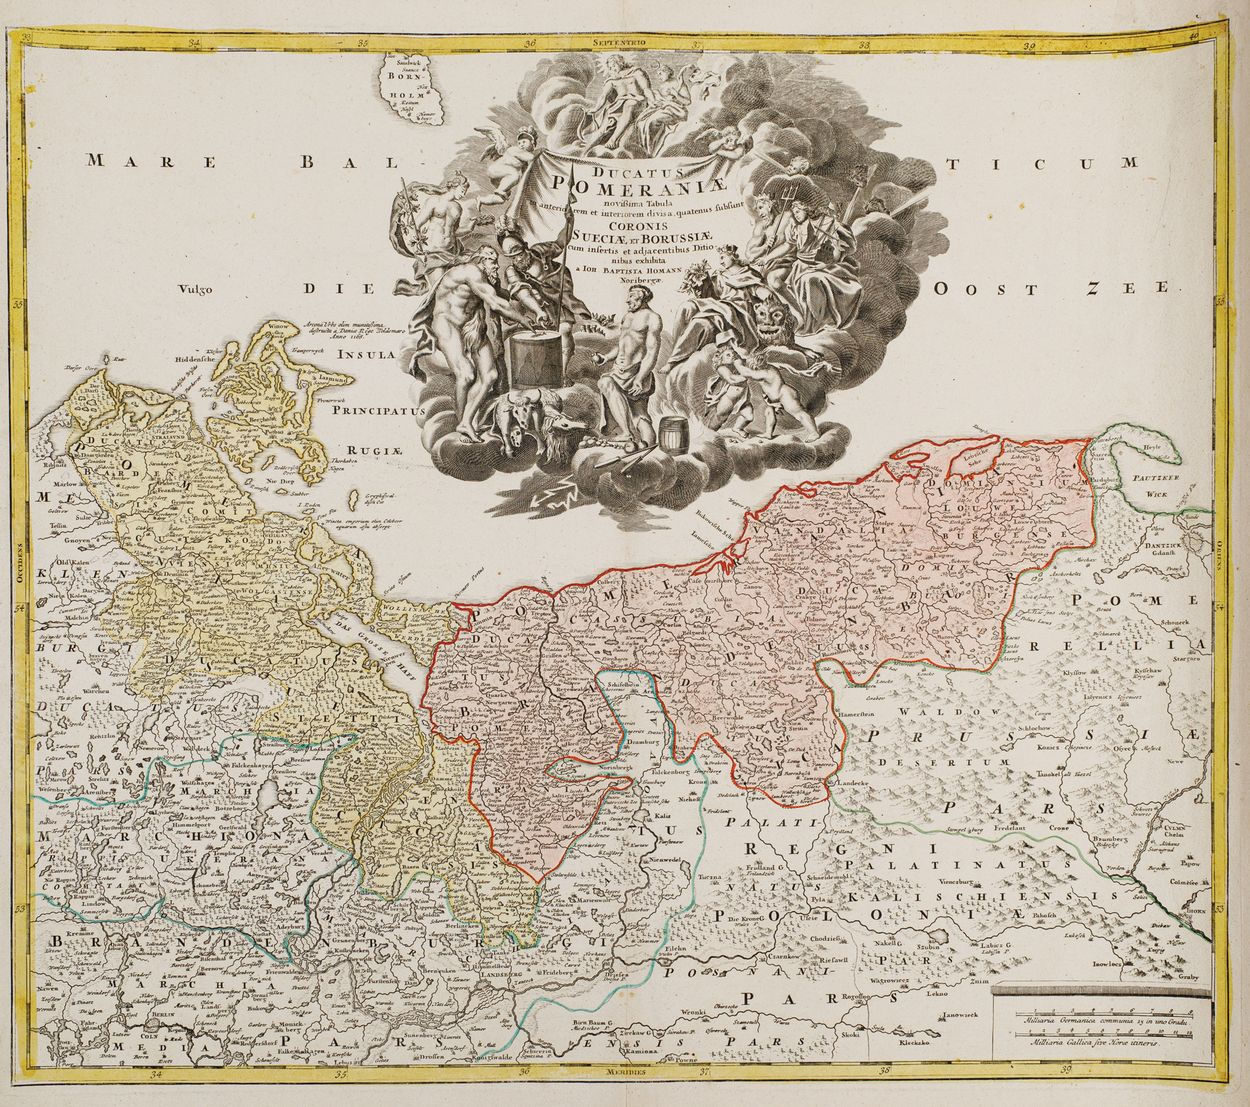 MAPA KSIĘSTWA POMORSKIEGO, Norymberga, Johan Baptist Homann, ok. 1720